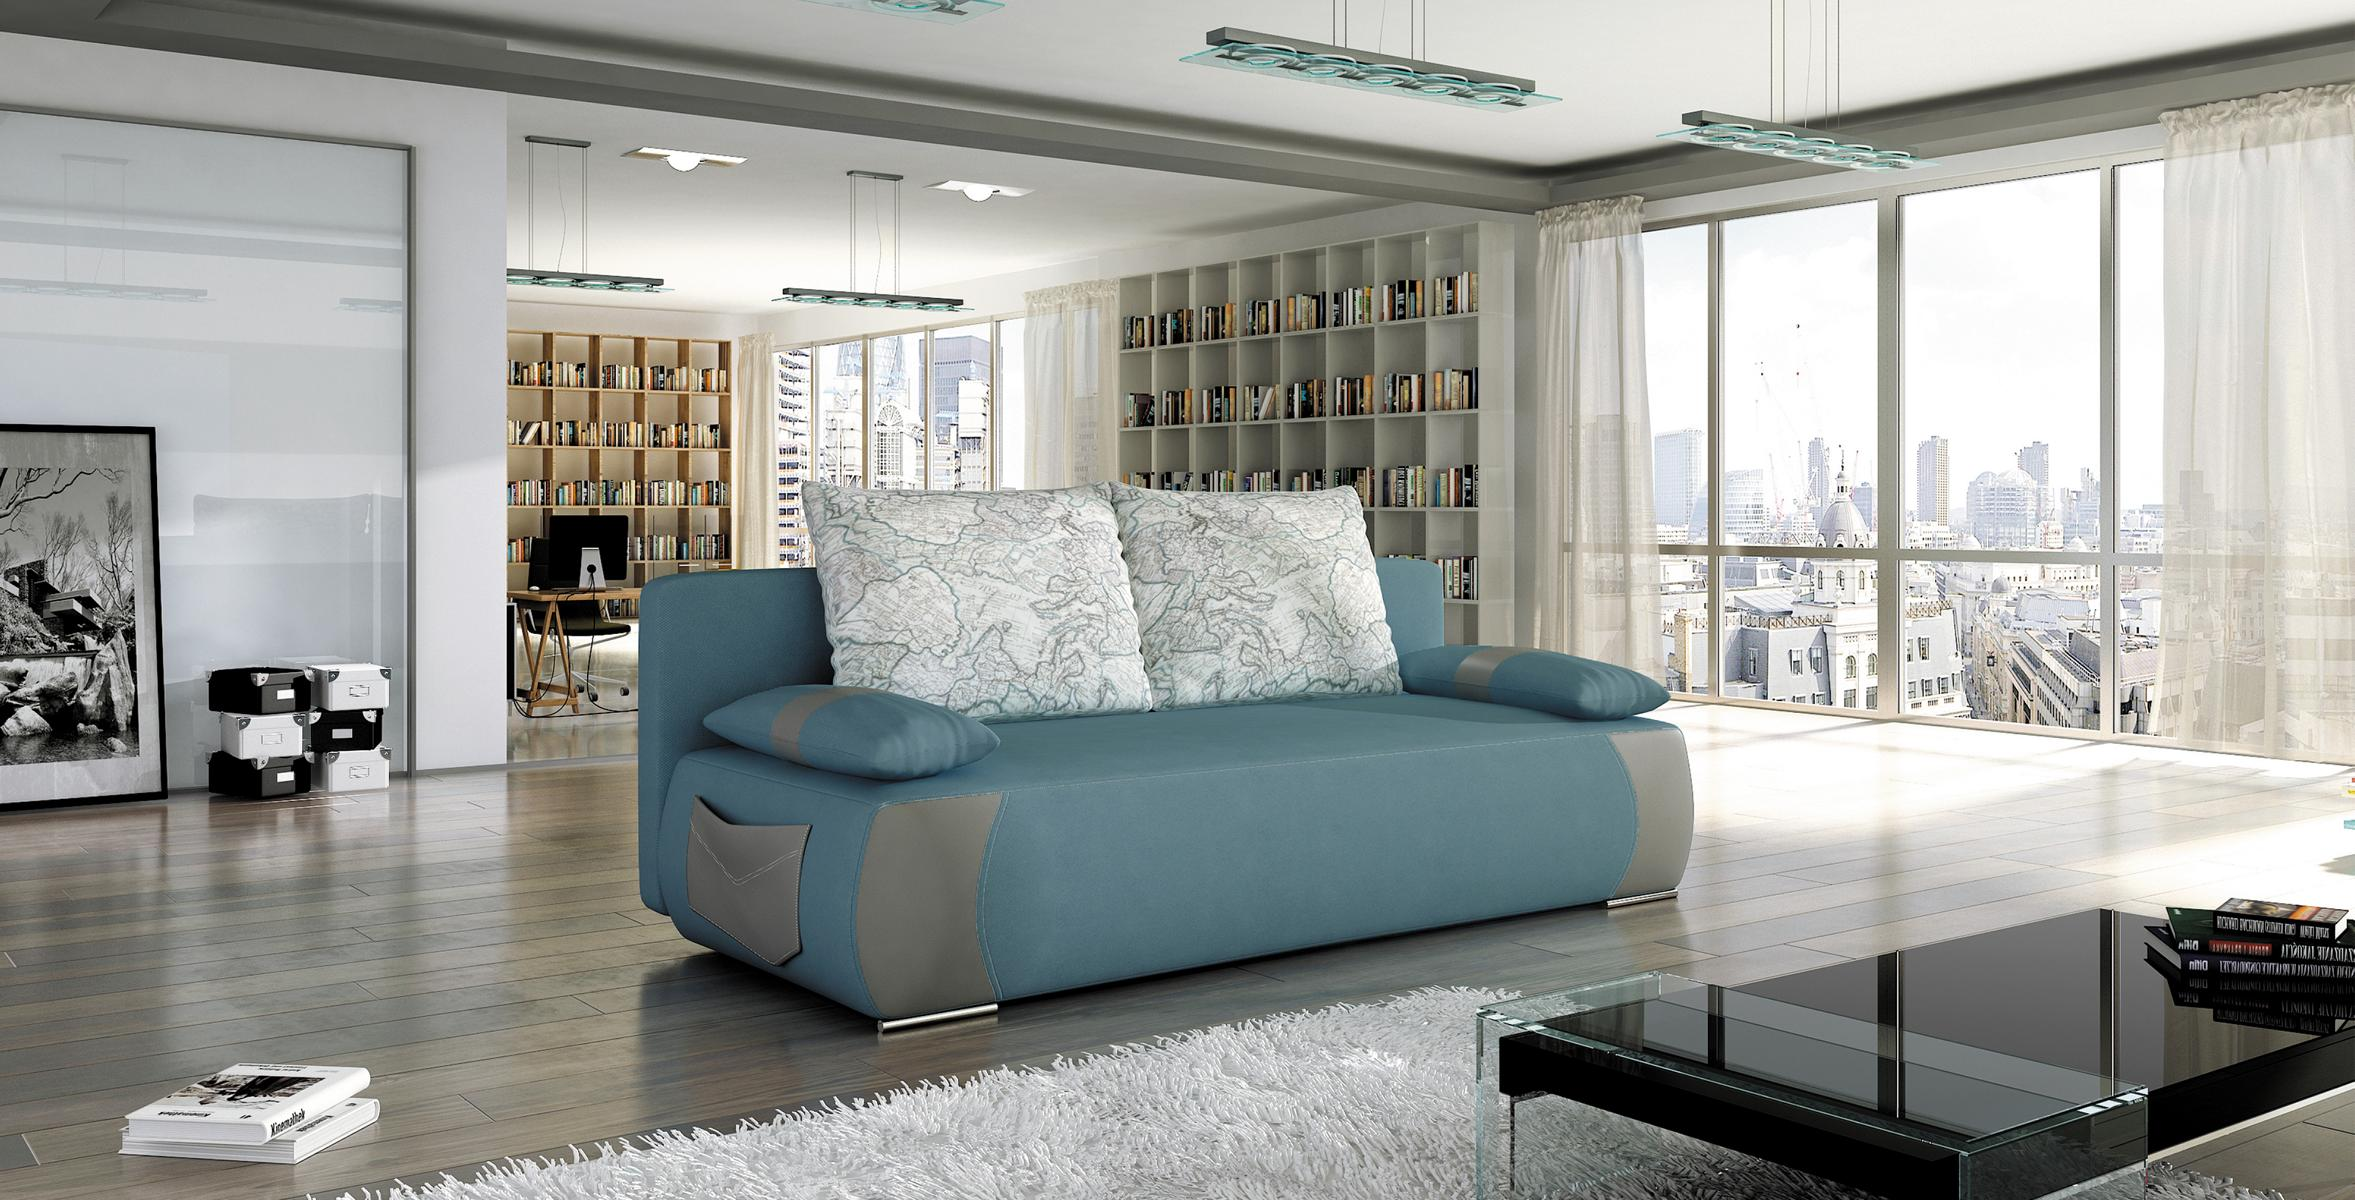 Sofa schlafsofa designer 3 sitzer sofa mit bettfunktion for Schlafsofa 3 sitzer mit bettkasten